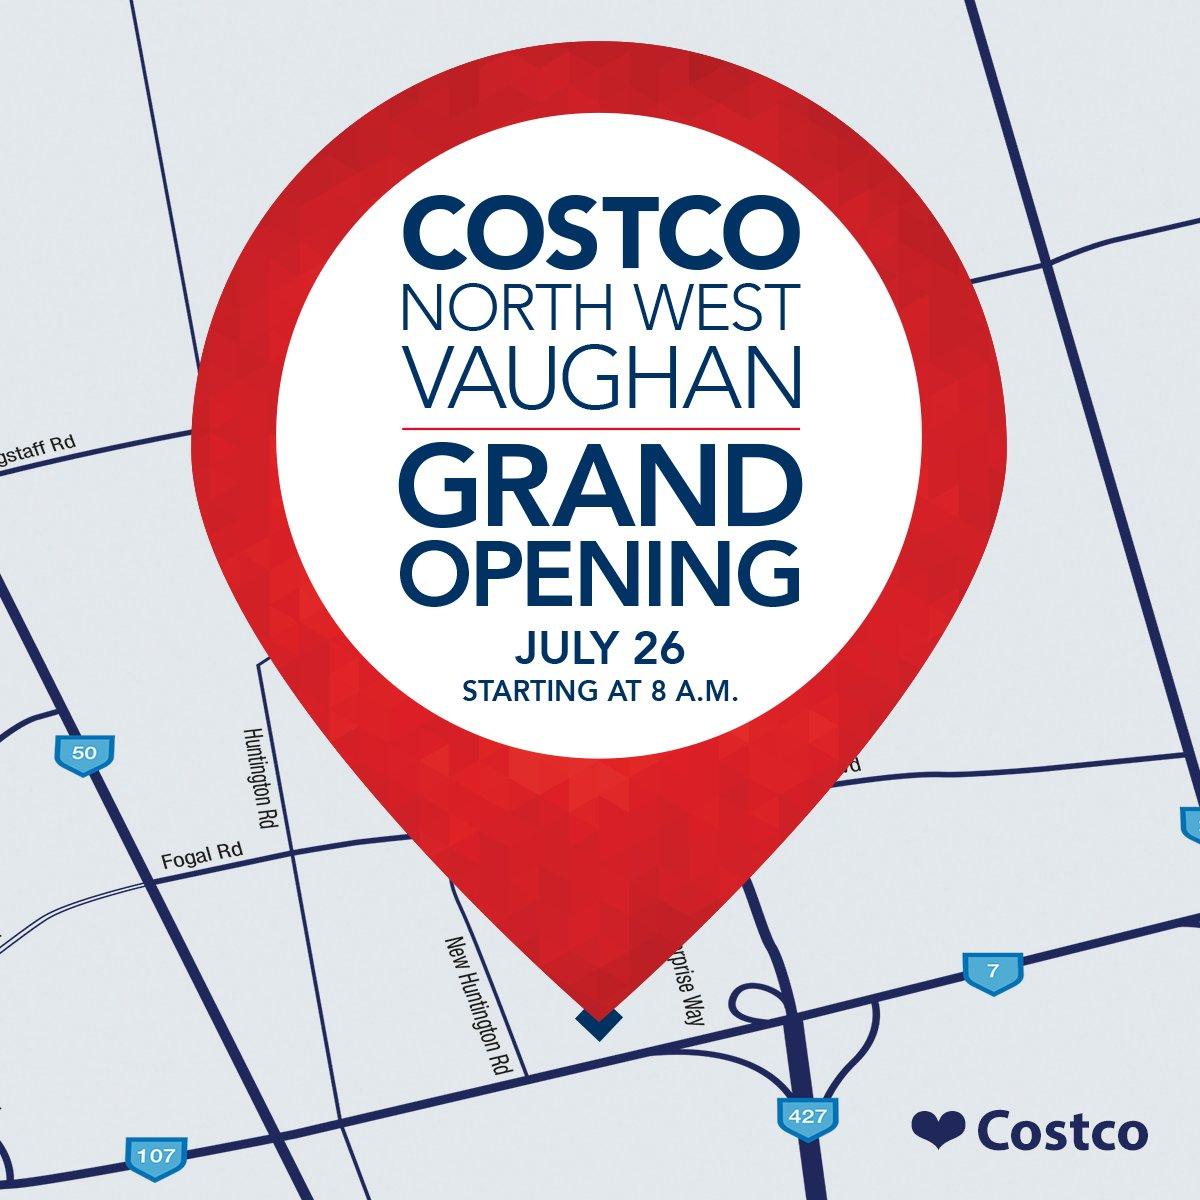 Costco Canada on Twitter: